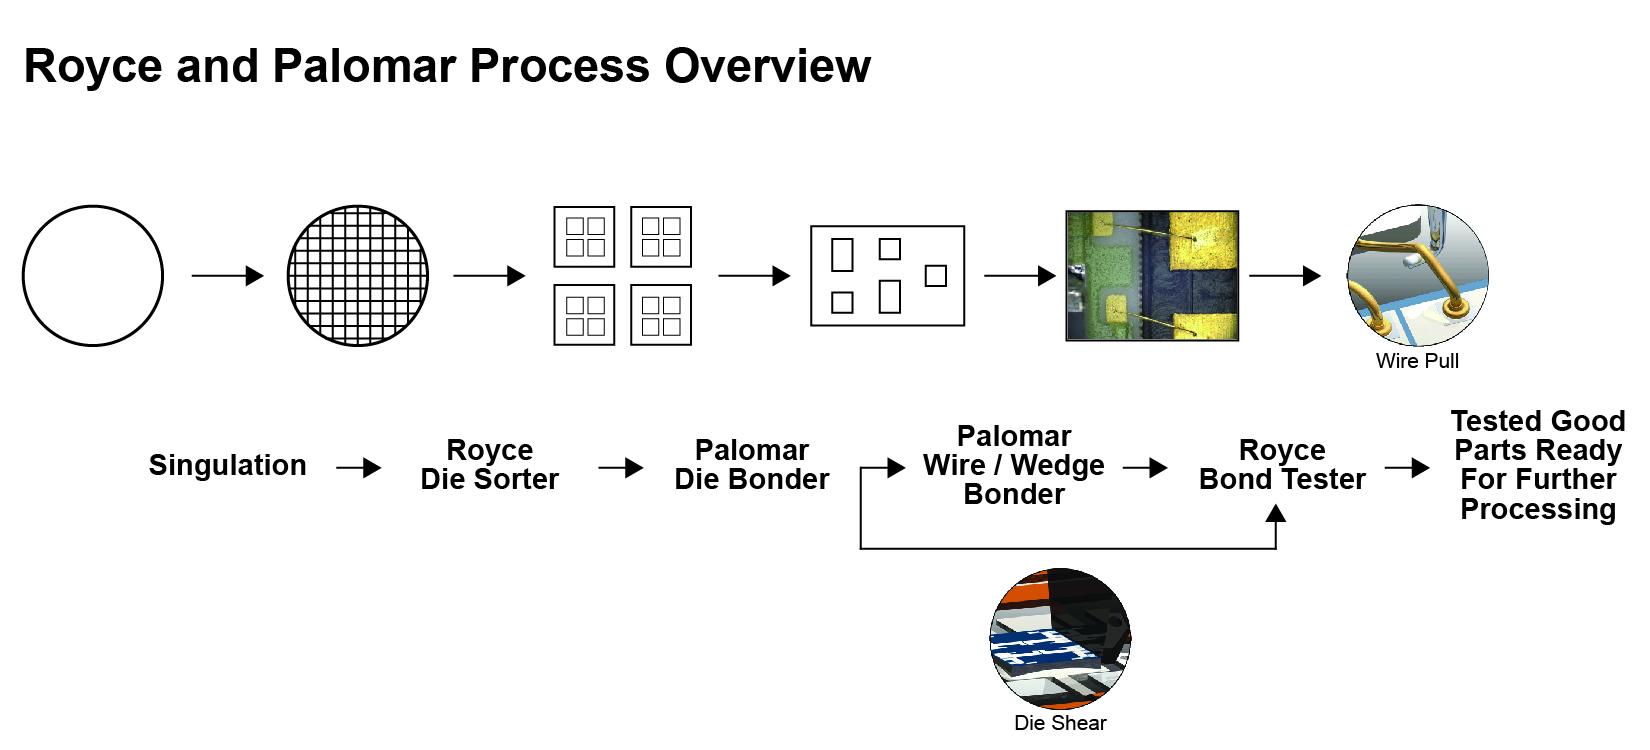 Royce_Palomar_Process_Overview.jpg